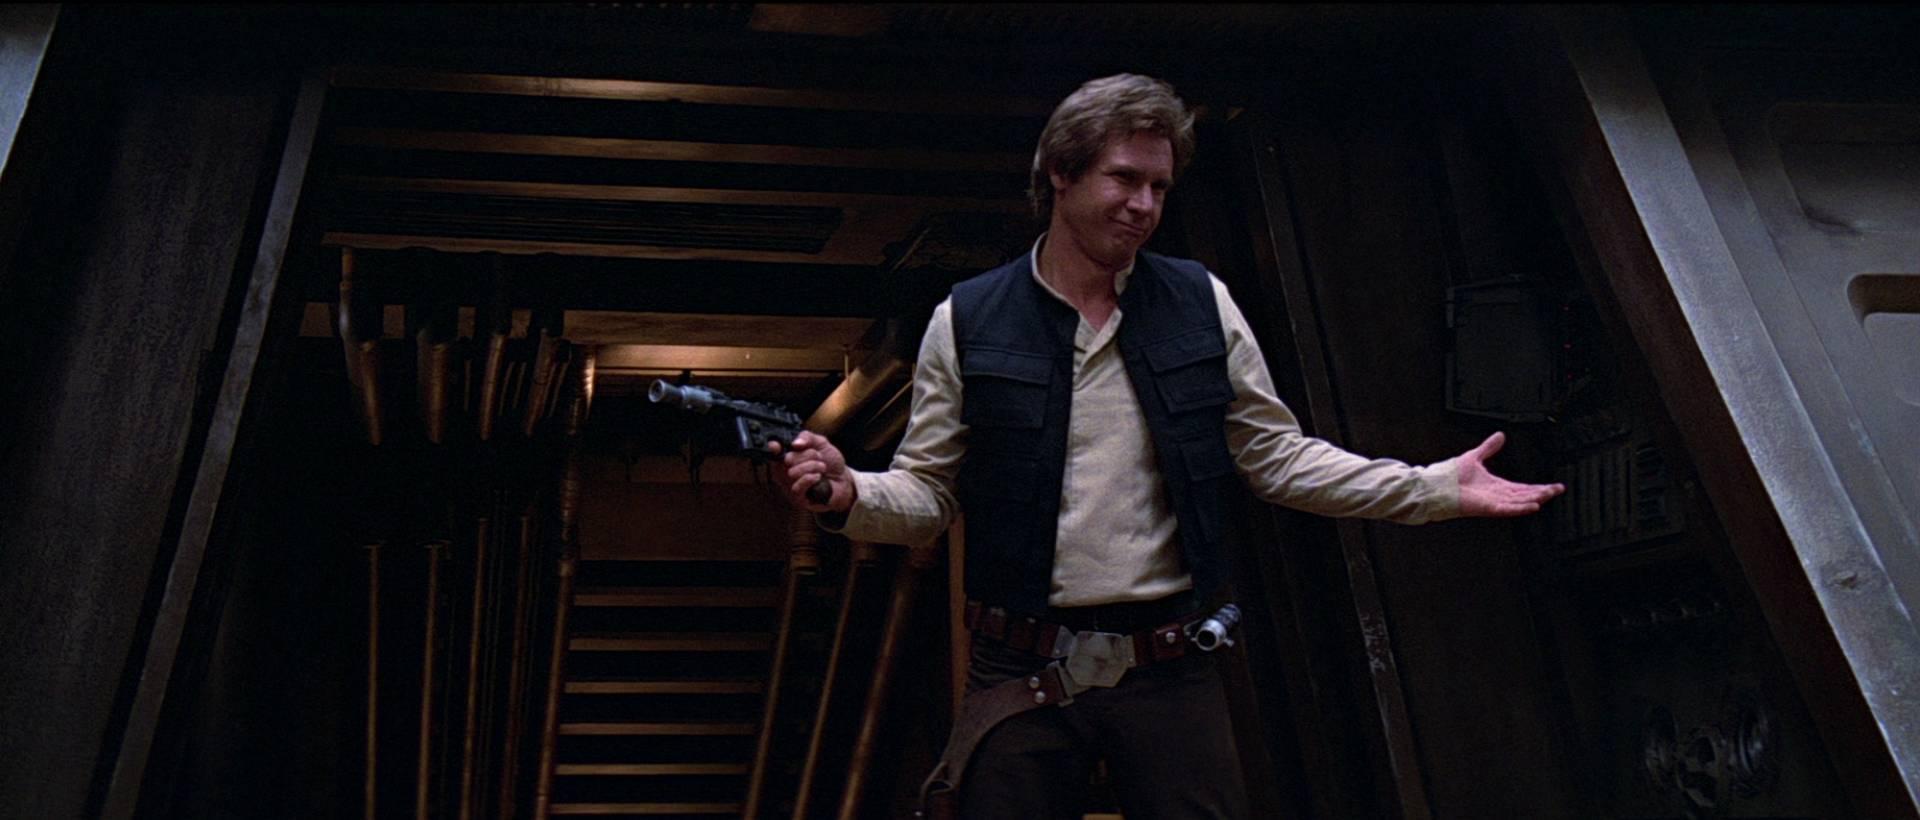 Return_Of_theJedi_Han_Solo